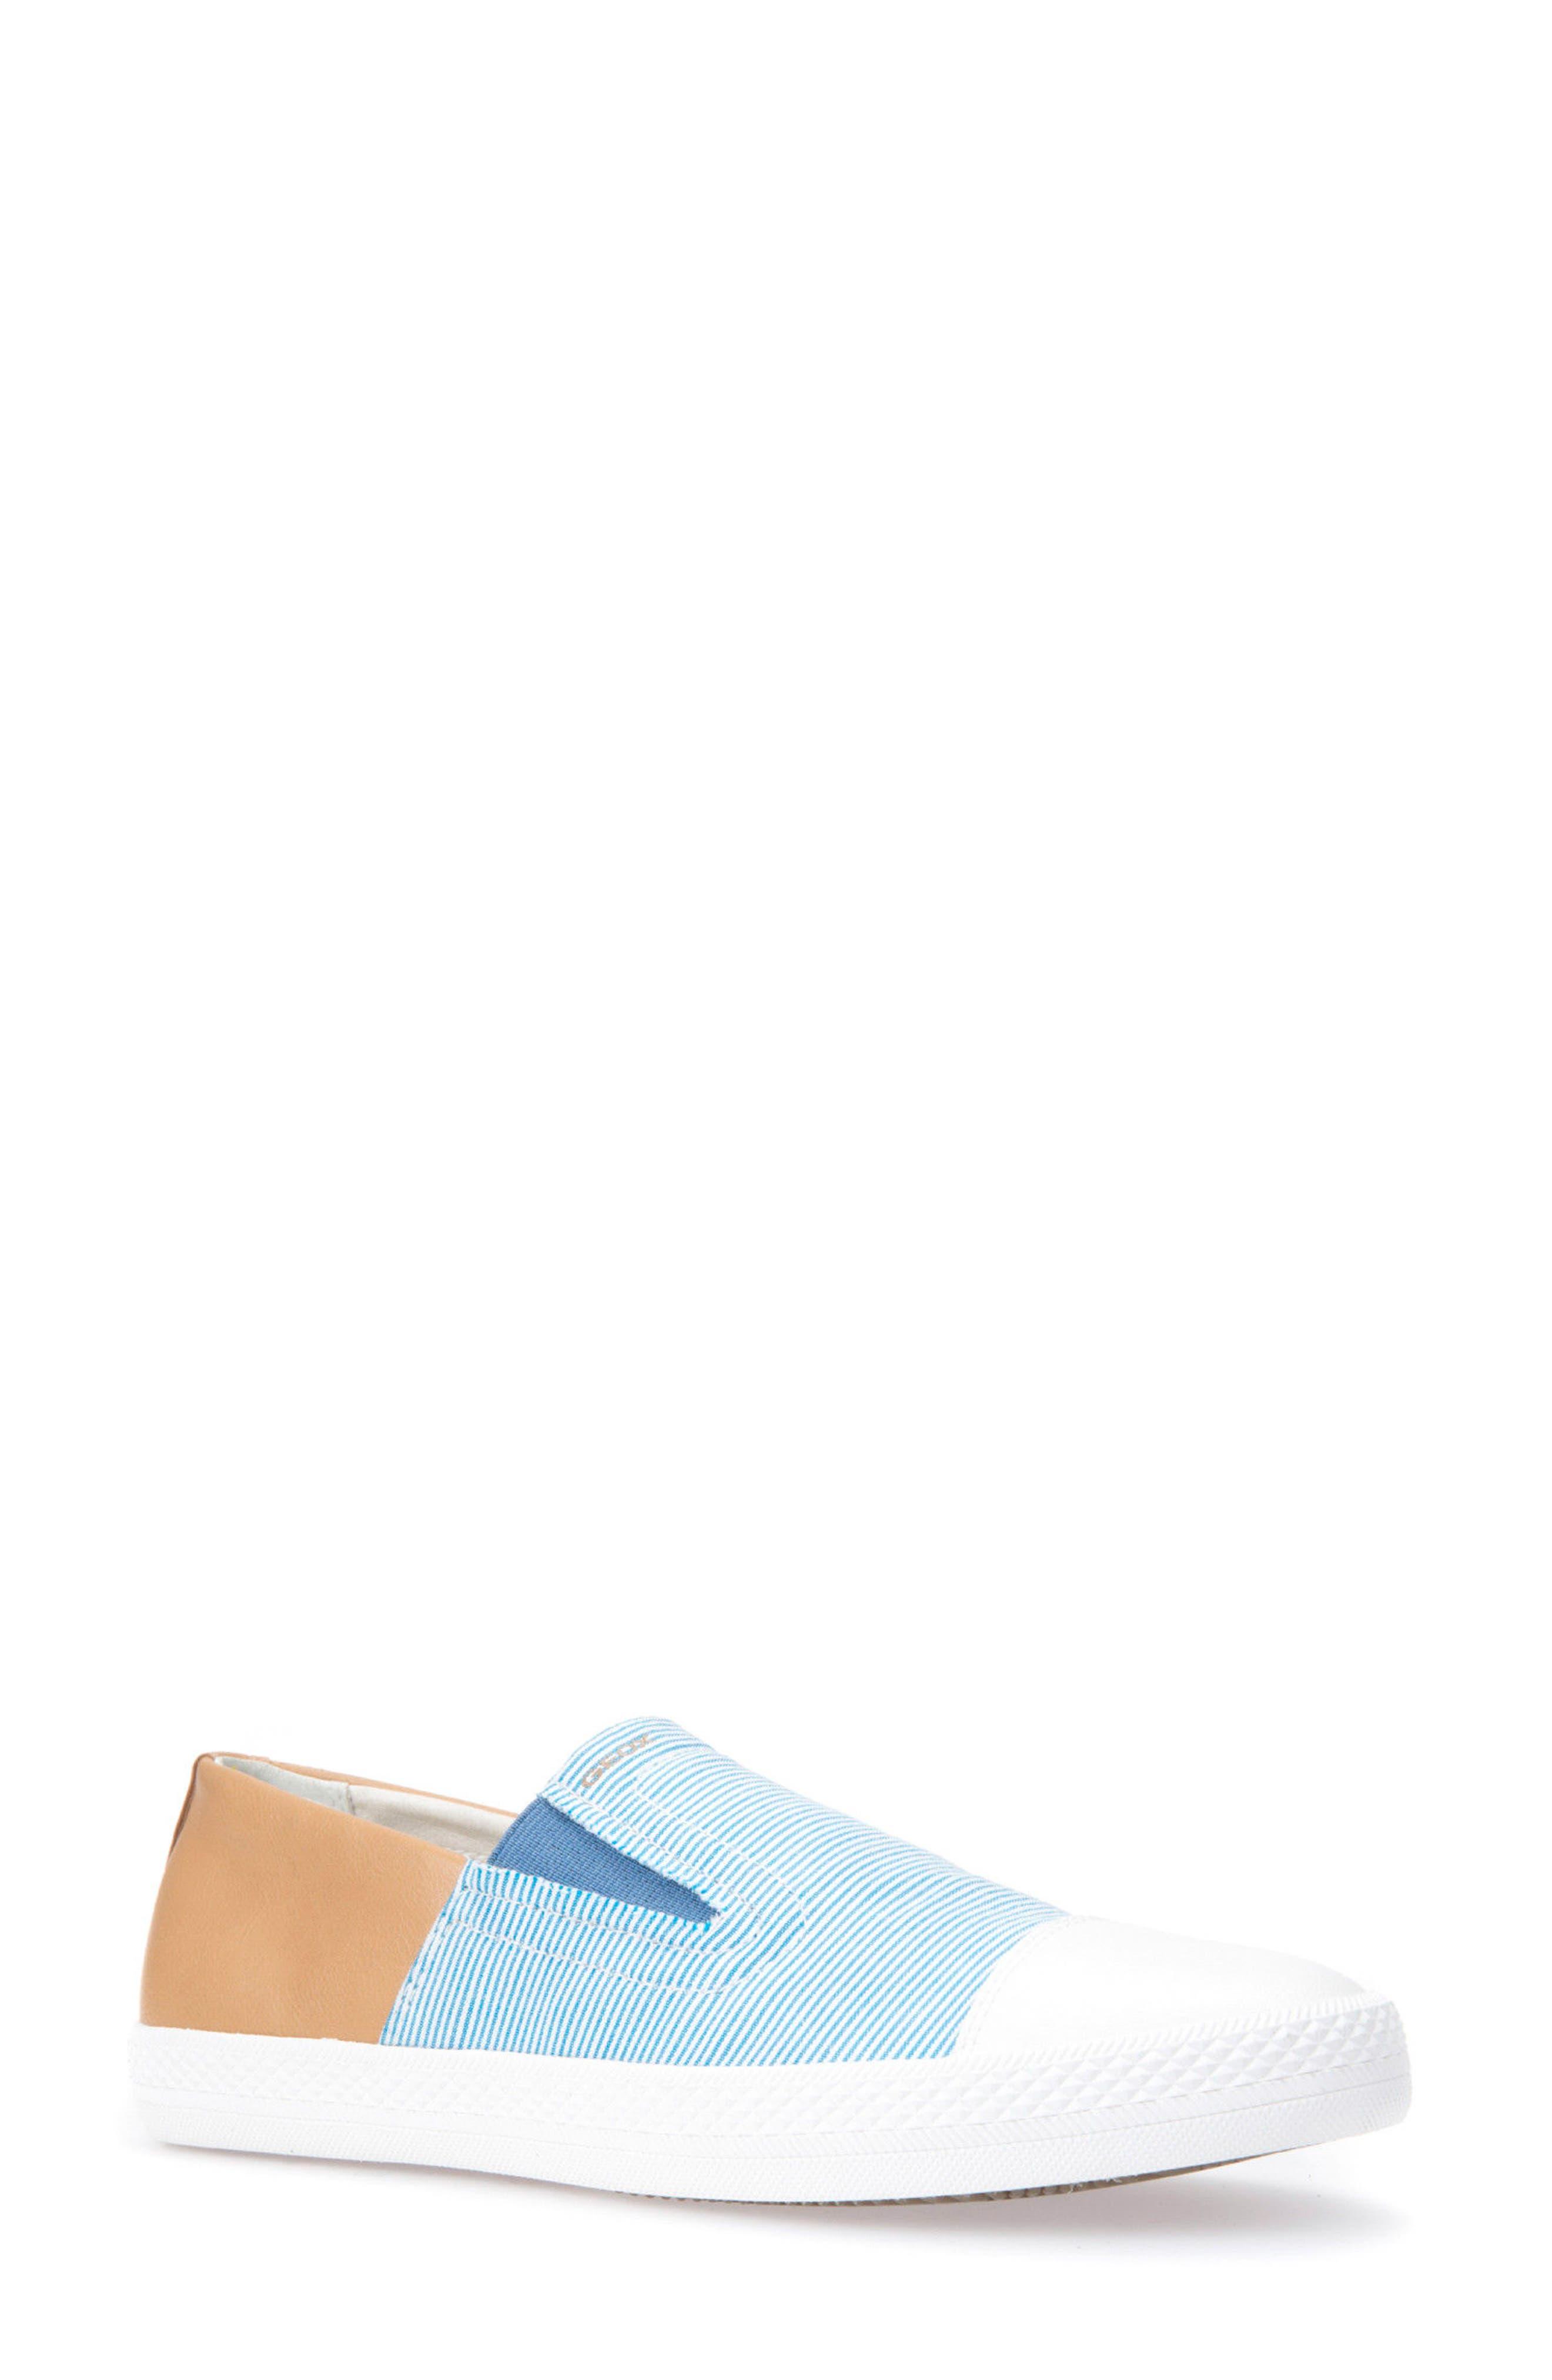 GIYO SLIP-ON SNEAKER